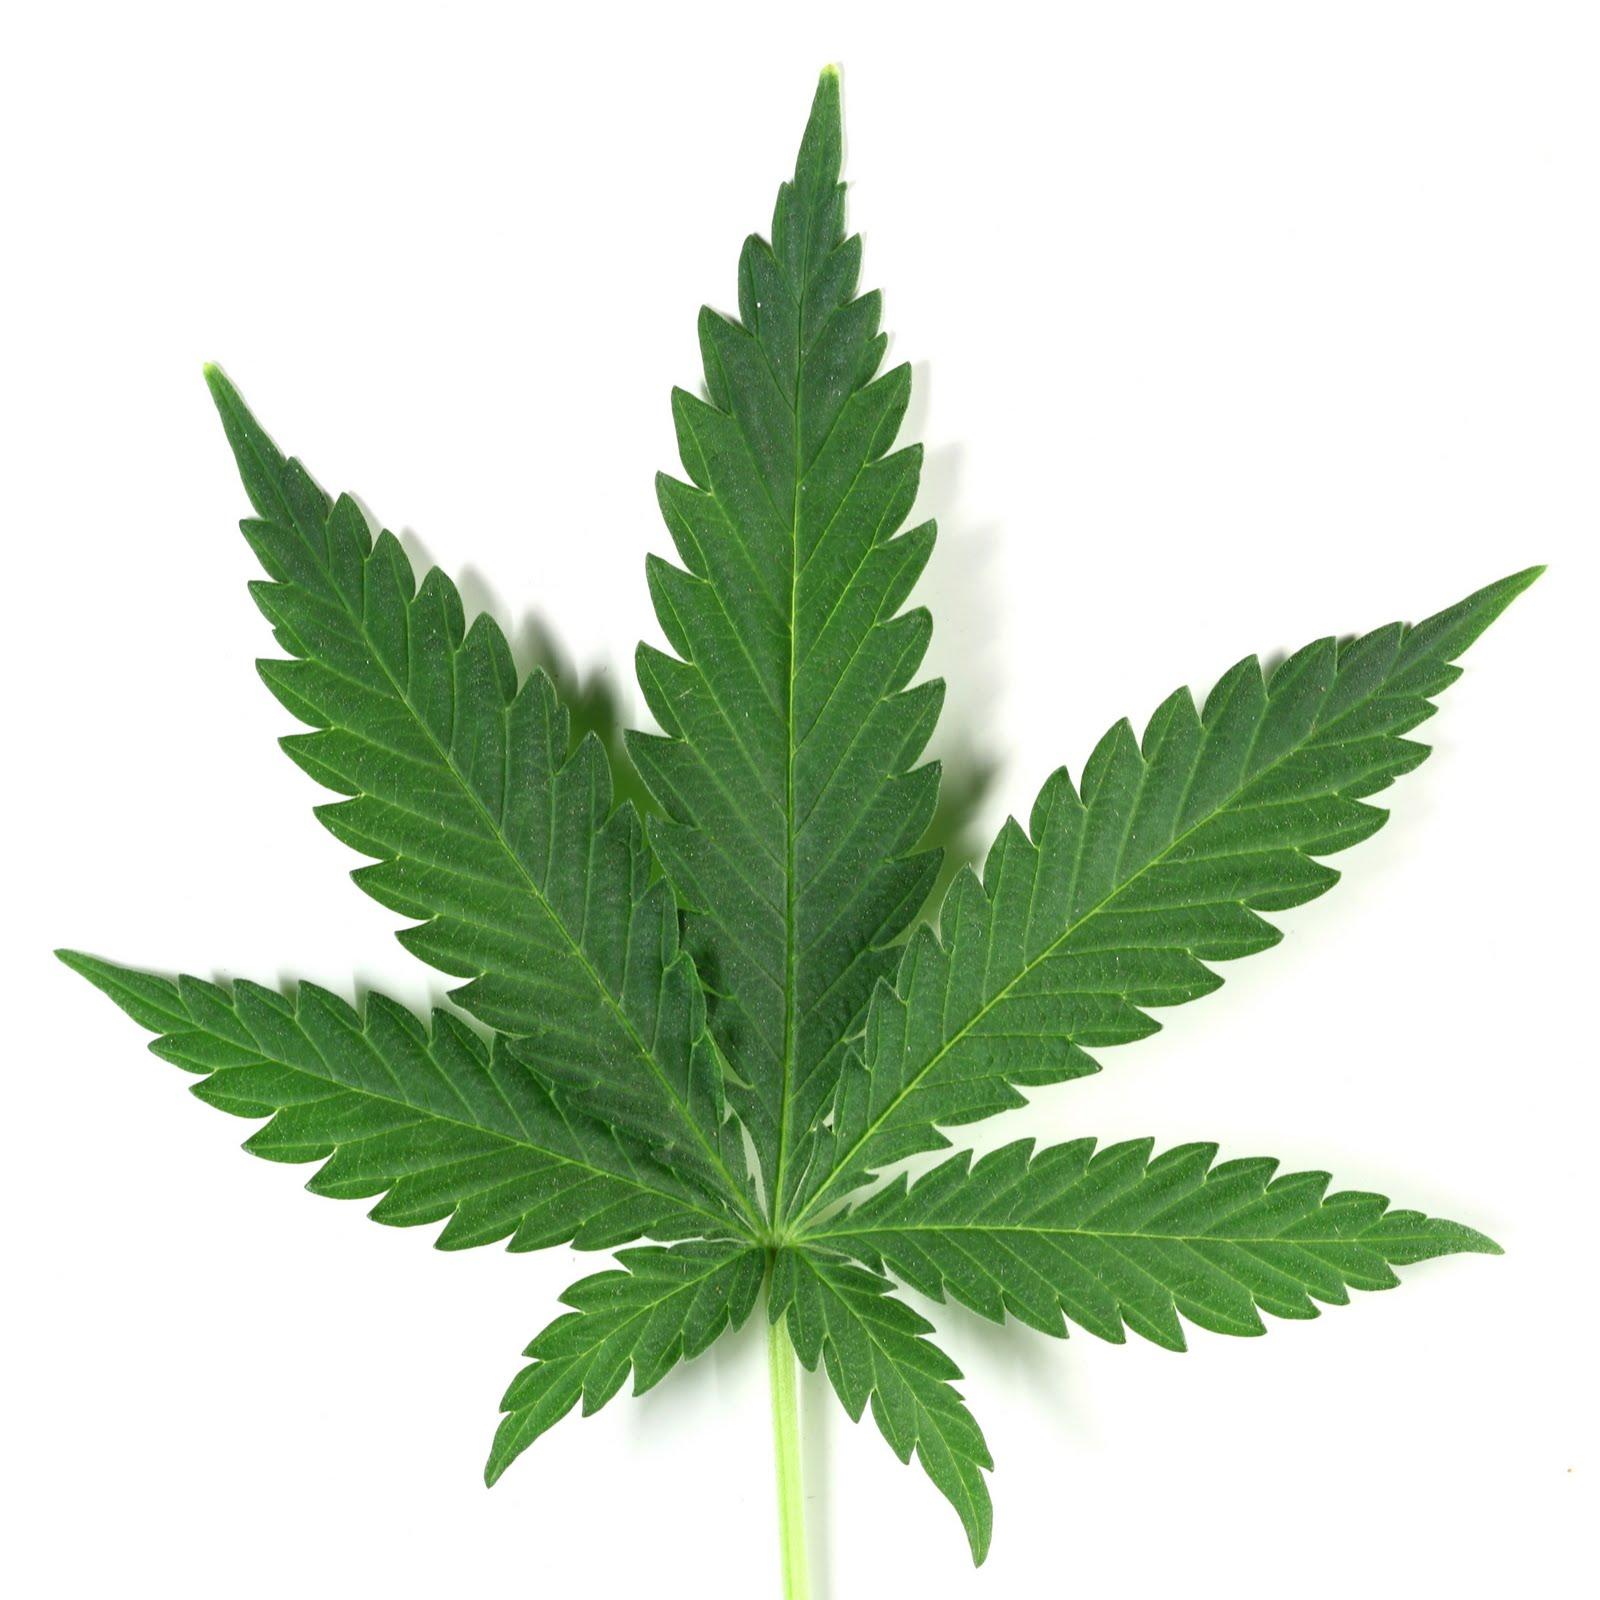 http://4.bp.blogspot.com/-wGncp8-Z7fs/TapsVNzfLjI/AAAAAAAABww/lhoLg_uLYfY/s1600/marijuana-leaf.jpg